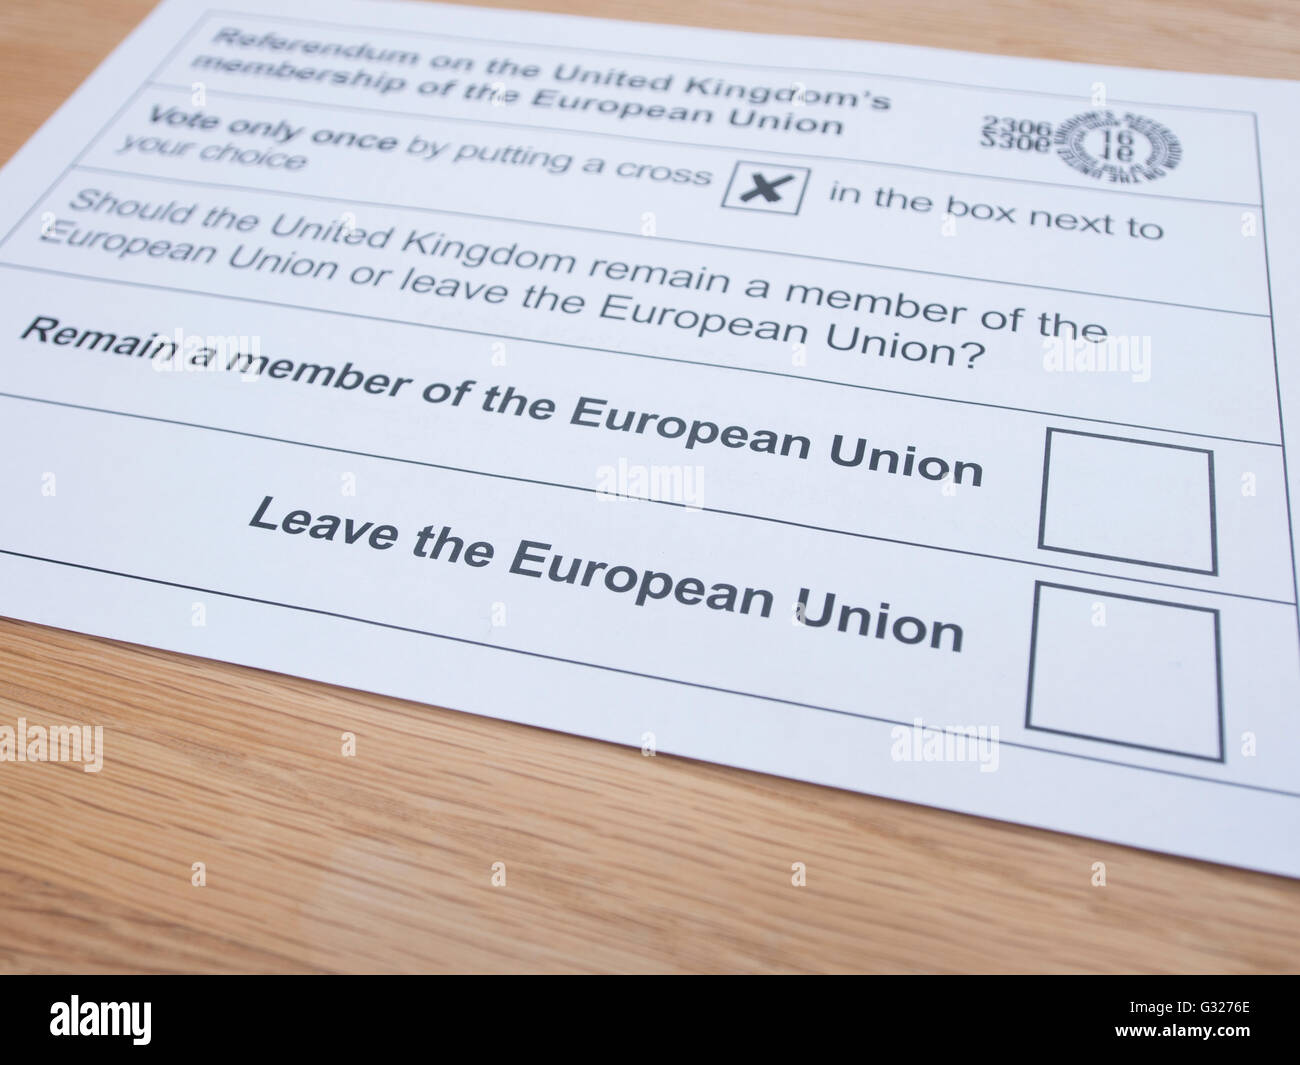 Exeter UK 7 June 2016 EU referendum voting by postal ballot - Stock Image